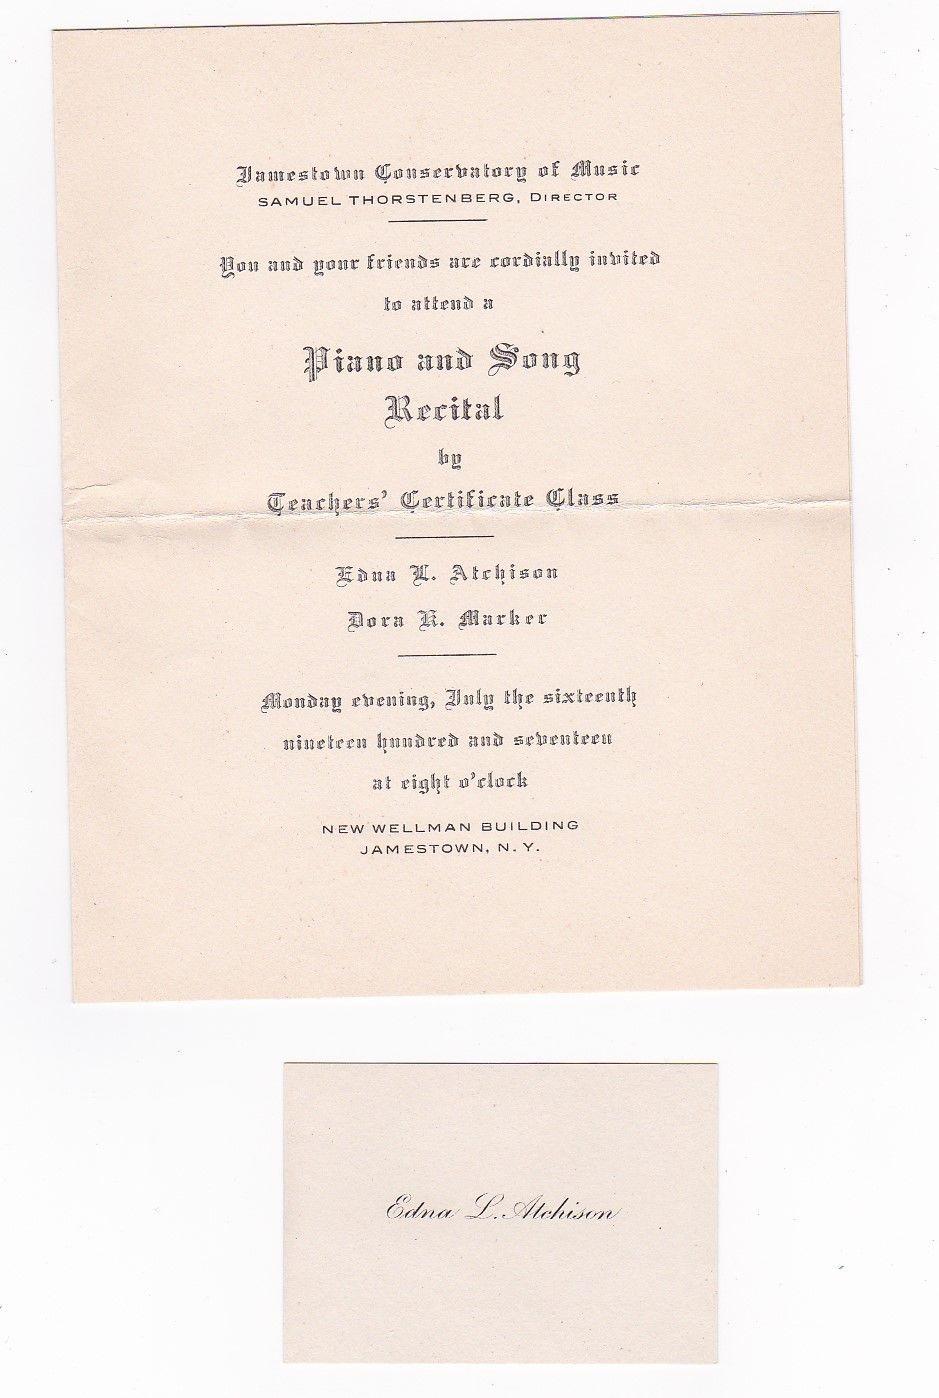 RANDOLPH NEW YORK JULY 12 1917 WITH RECITAL INVITATION